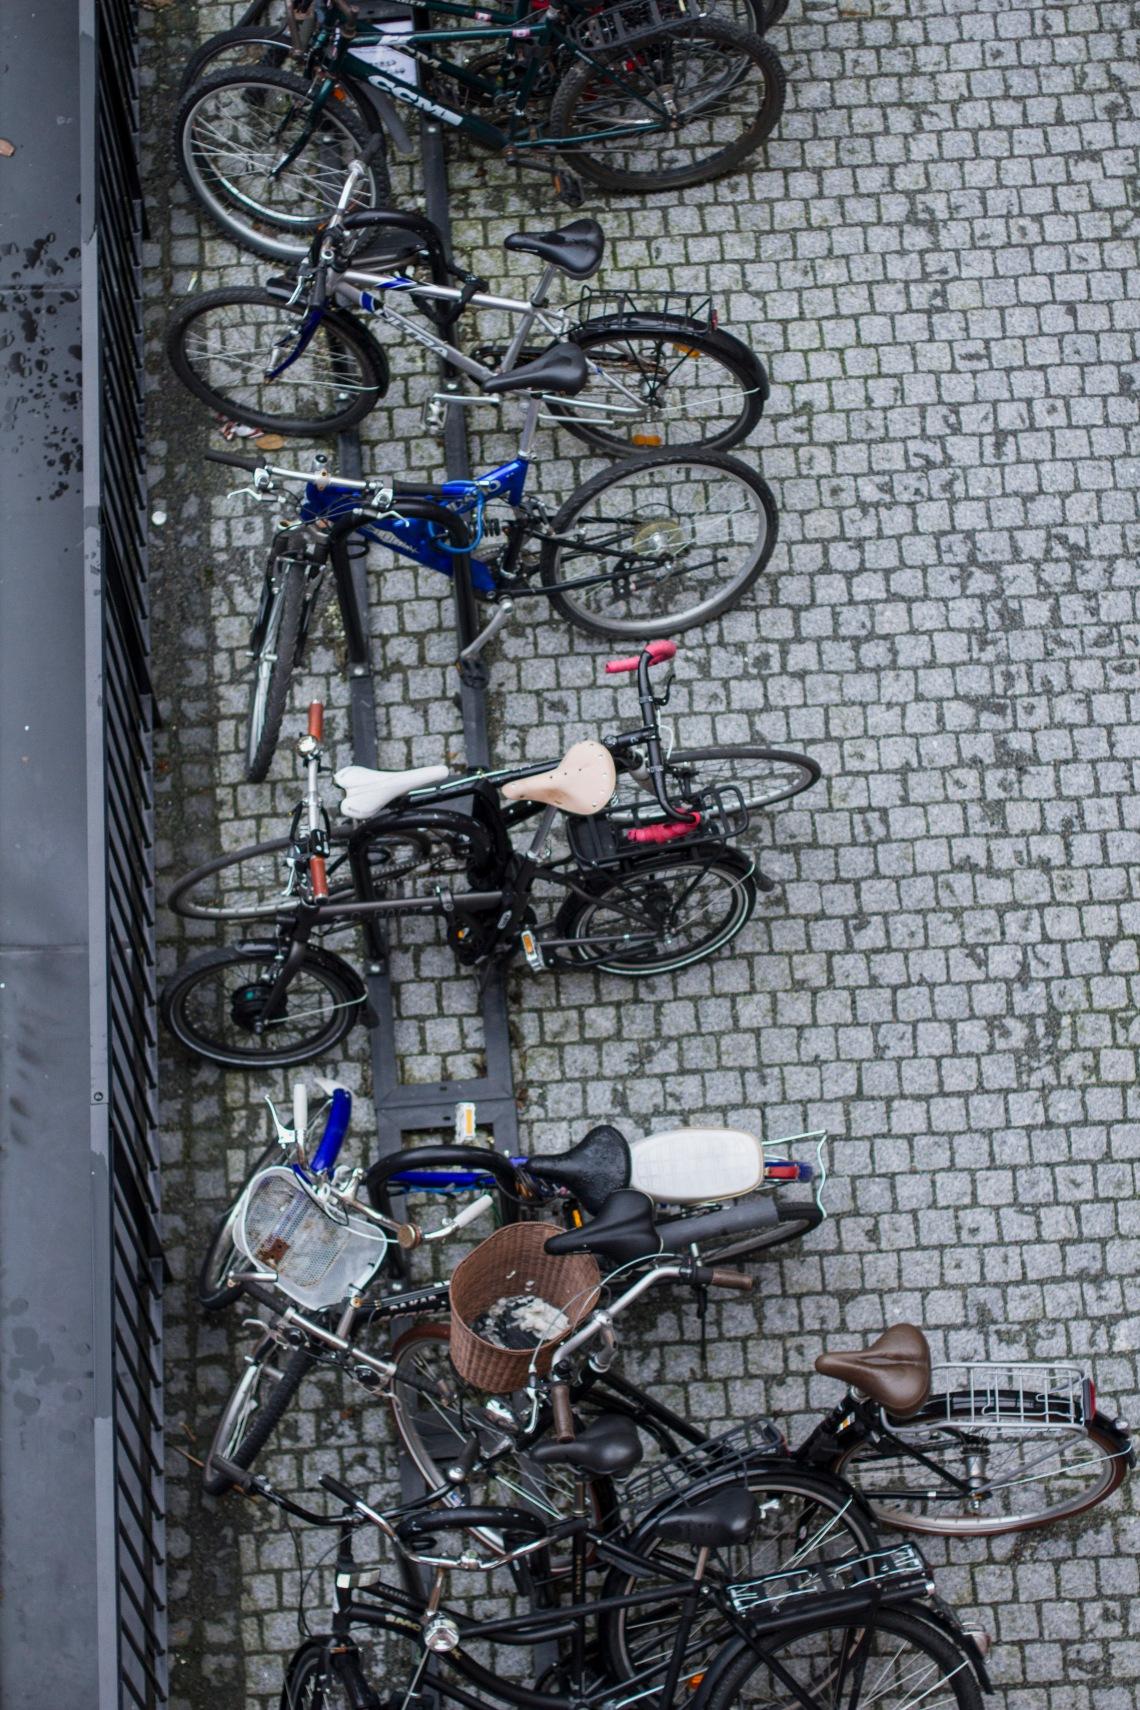 Stockholm bikes